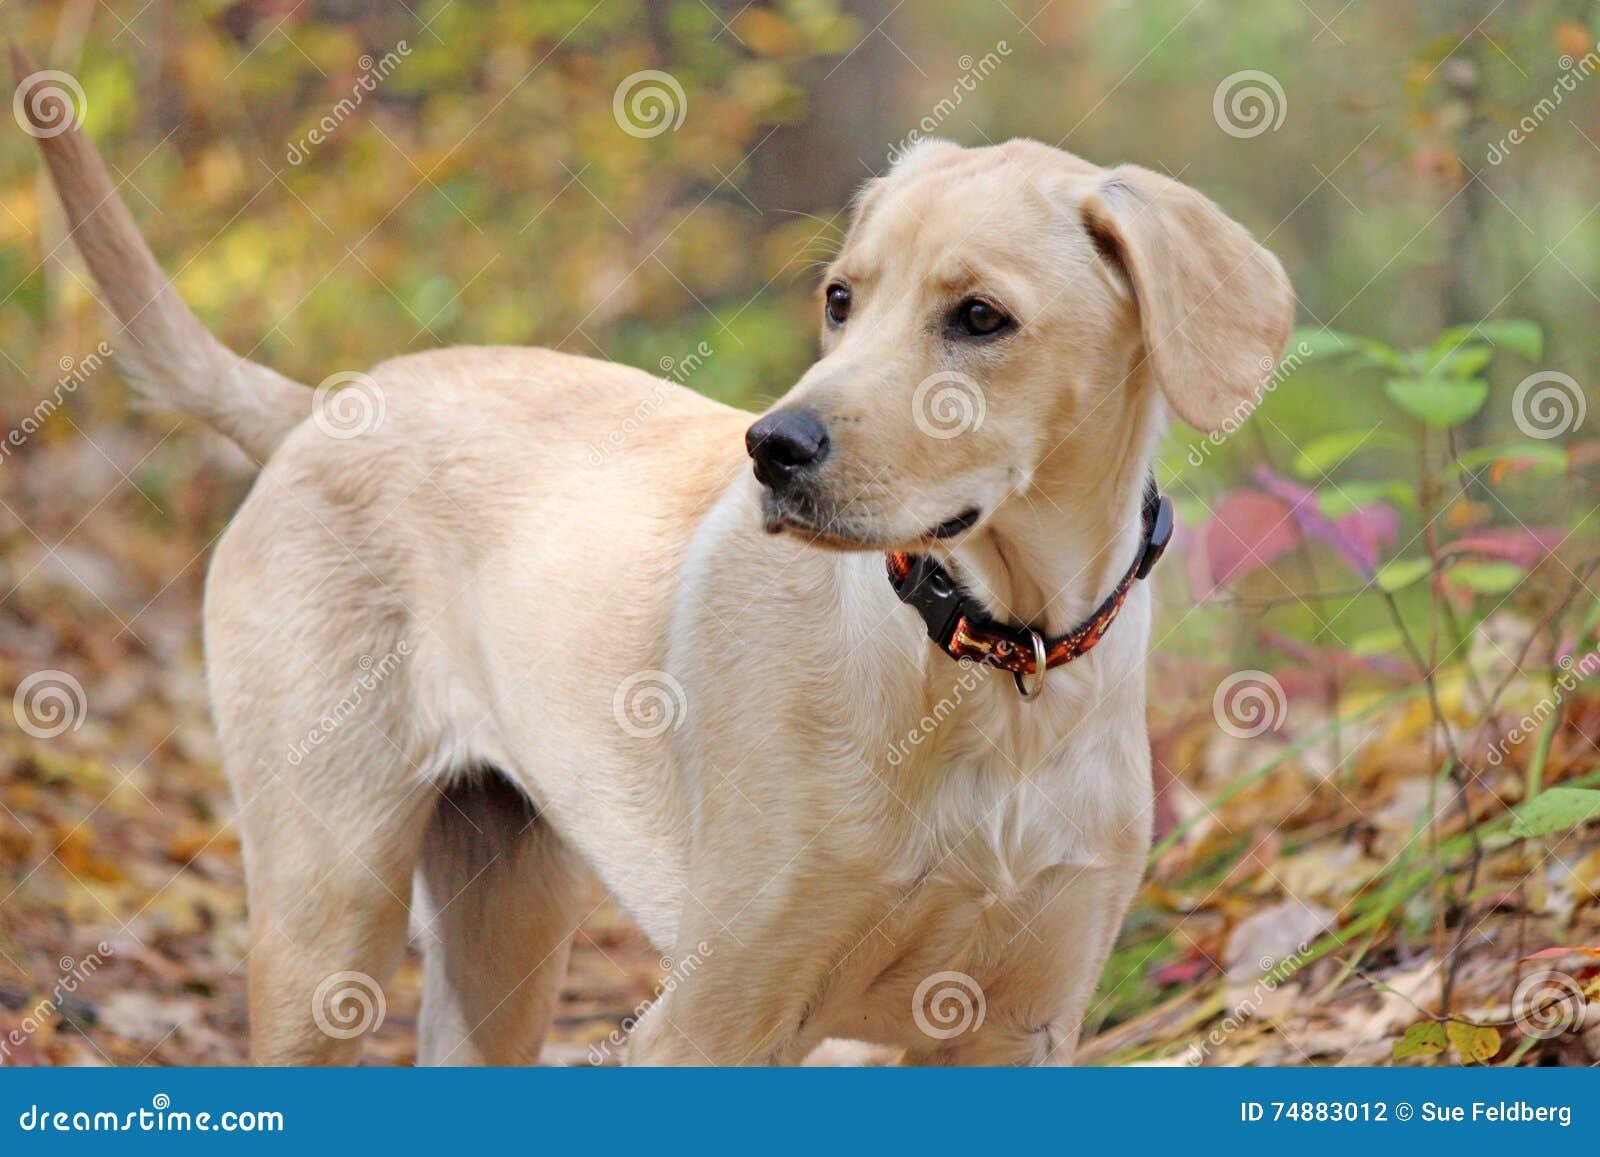 rare dog names - HD1280×853